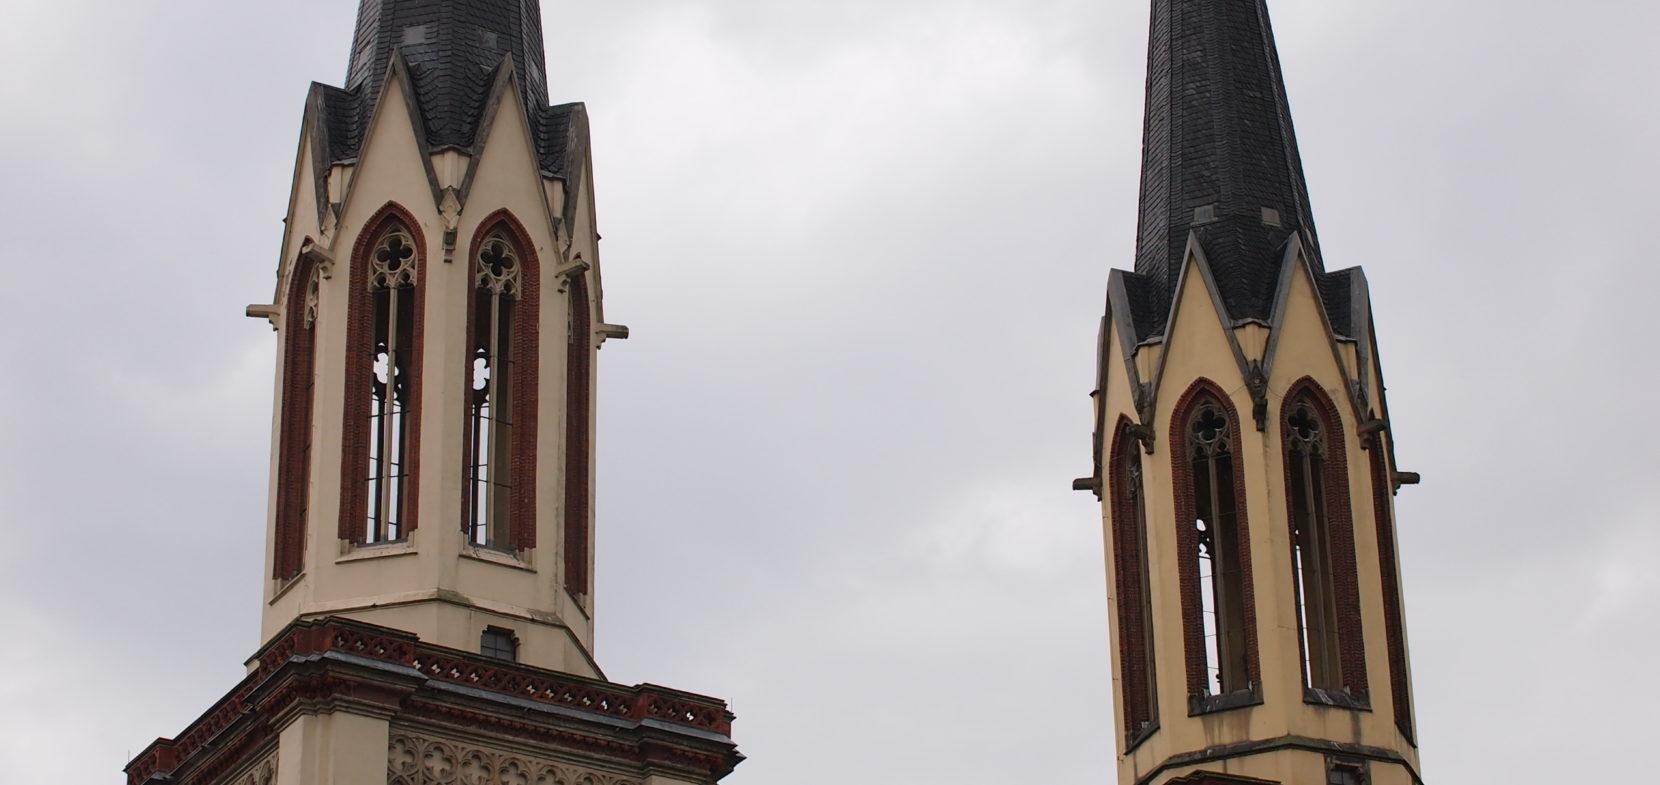 Ev.-Luth. Kirchgemeinde St. Jakobus im Vogtland